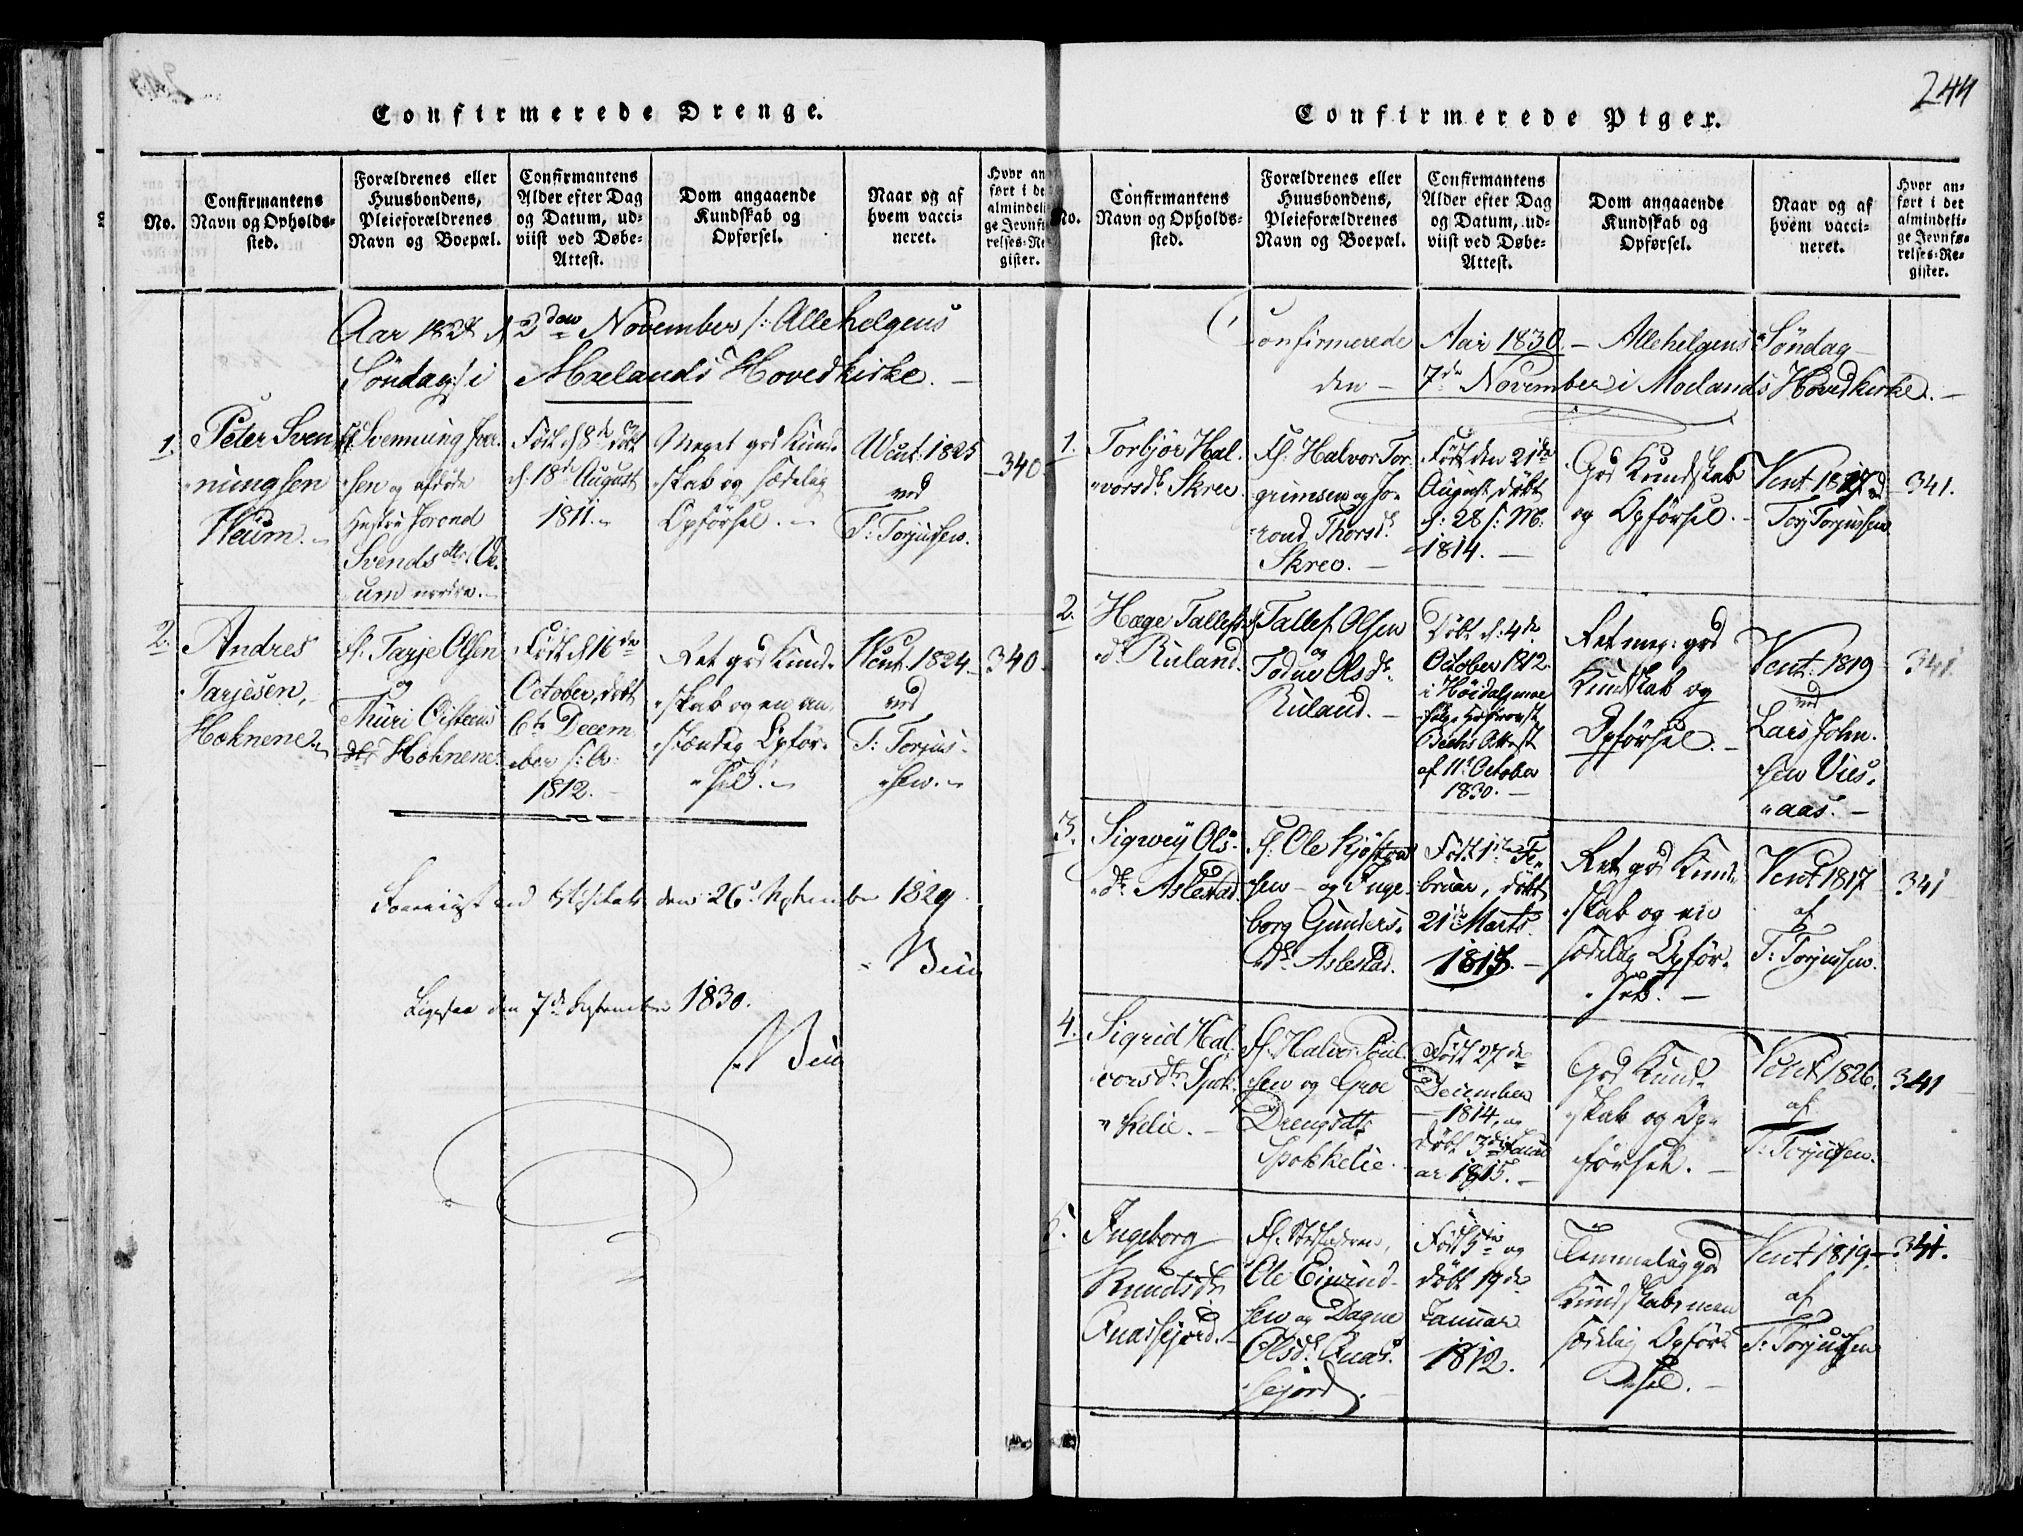 SAKO, Fyresdal kirkebøker, F/Fb/L0001: Ministerialbok nr. II 1, 1815-1854, s. 244